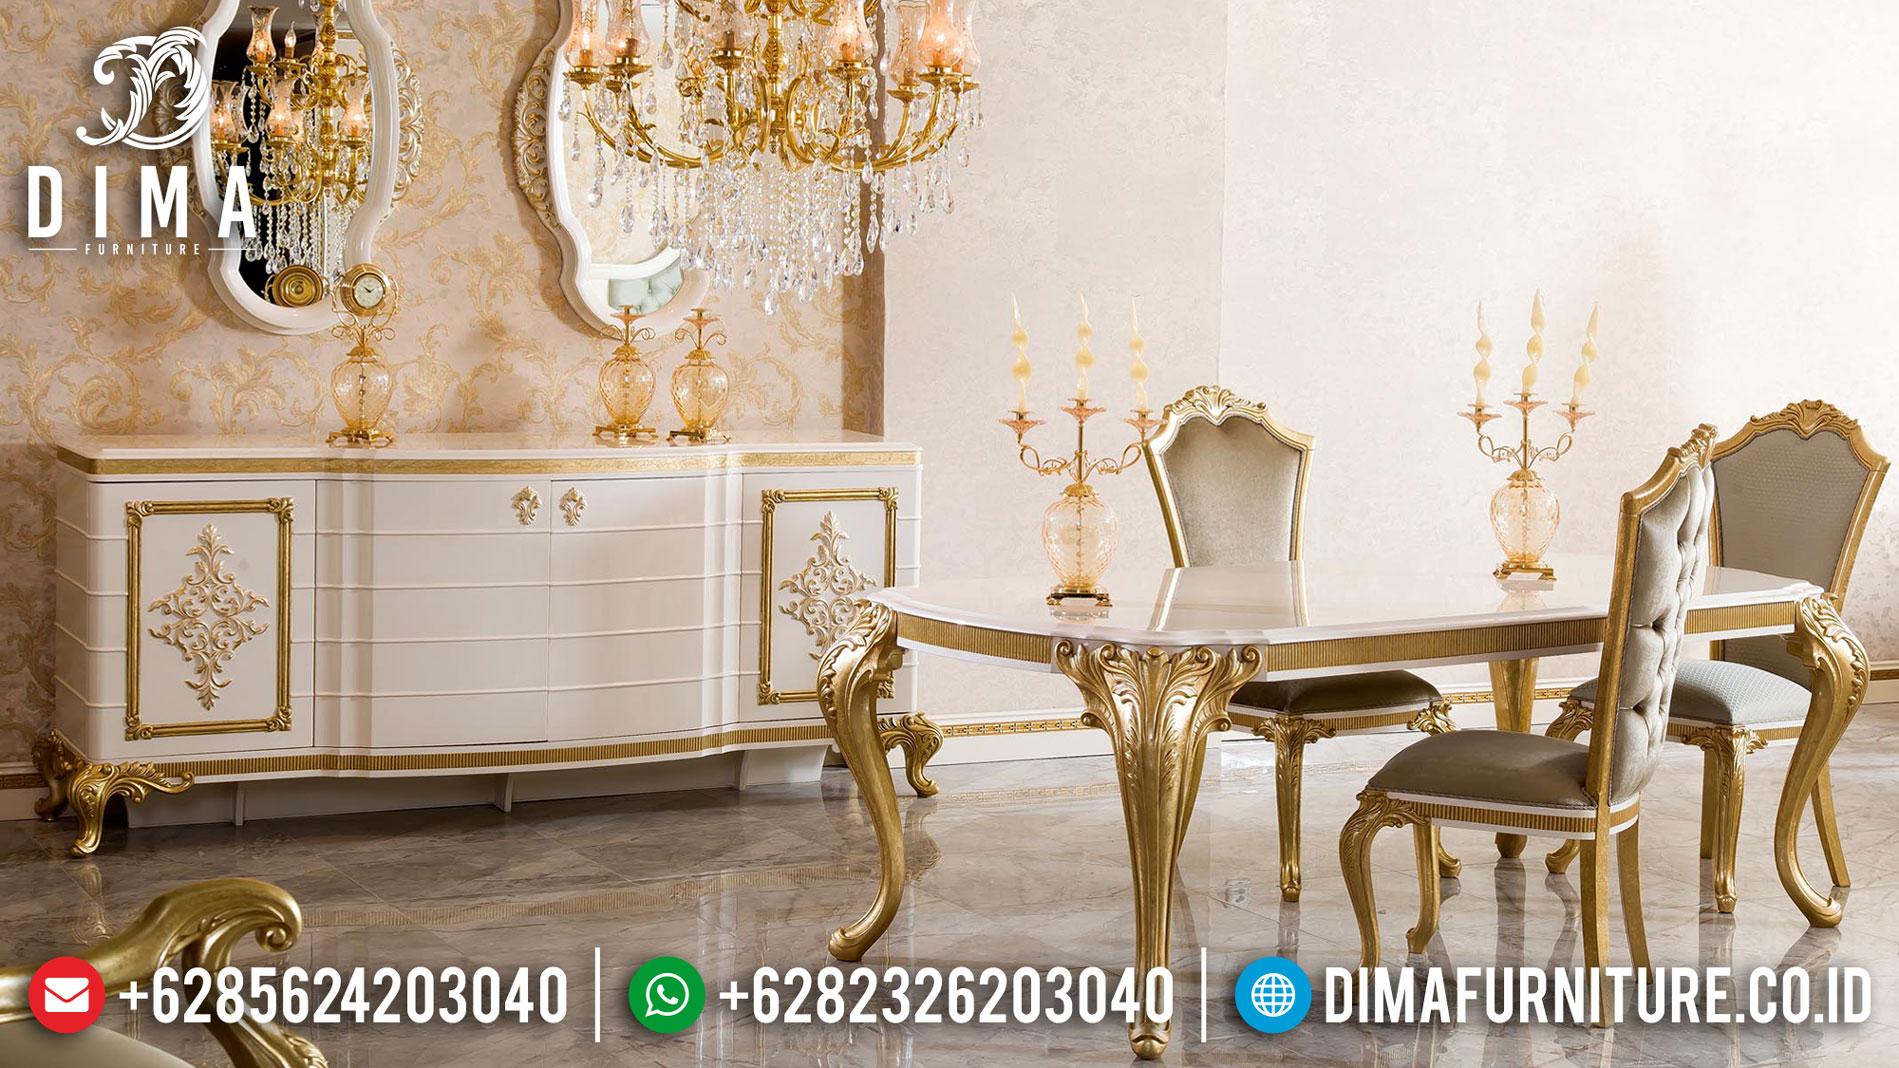 New Meja Makan Mewah Luxury Classic Golden Gloss Superior Design Inspiring ST-1036